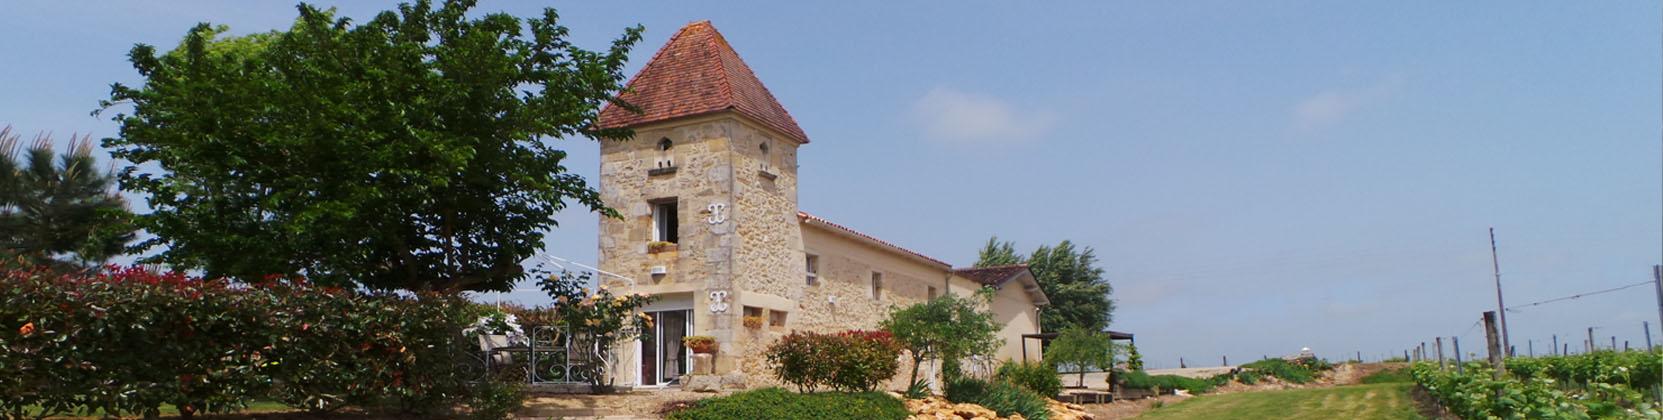 Le pigeonnier de Pezelin Gironde